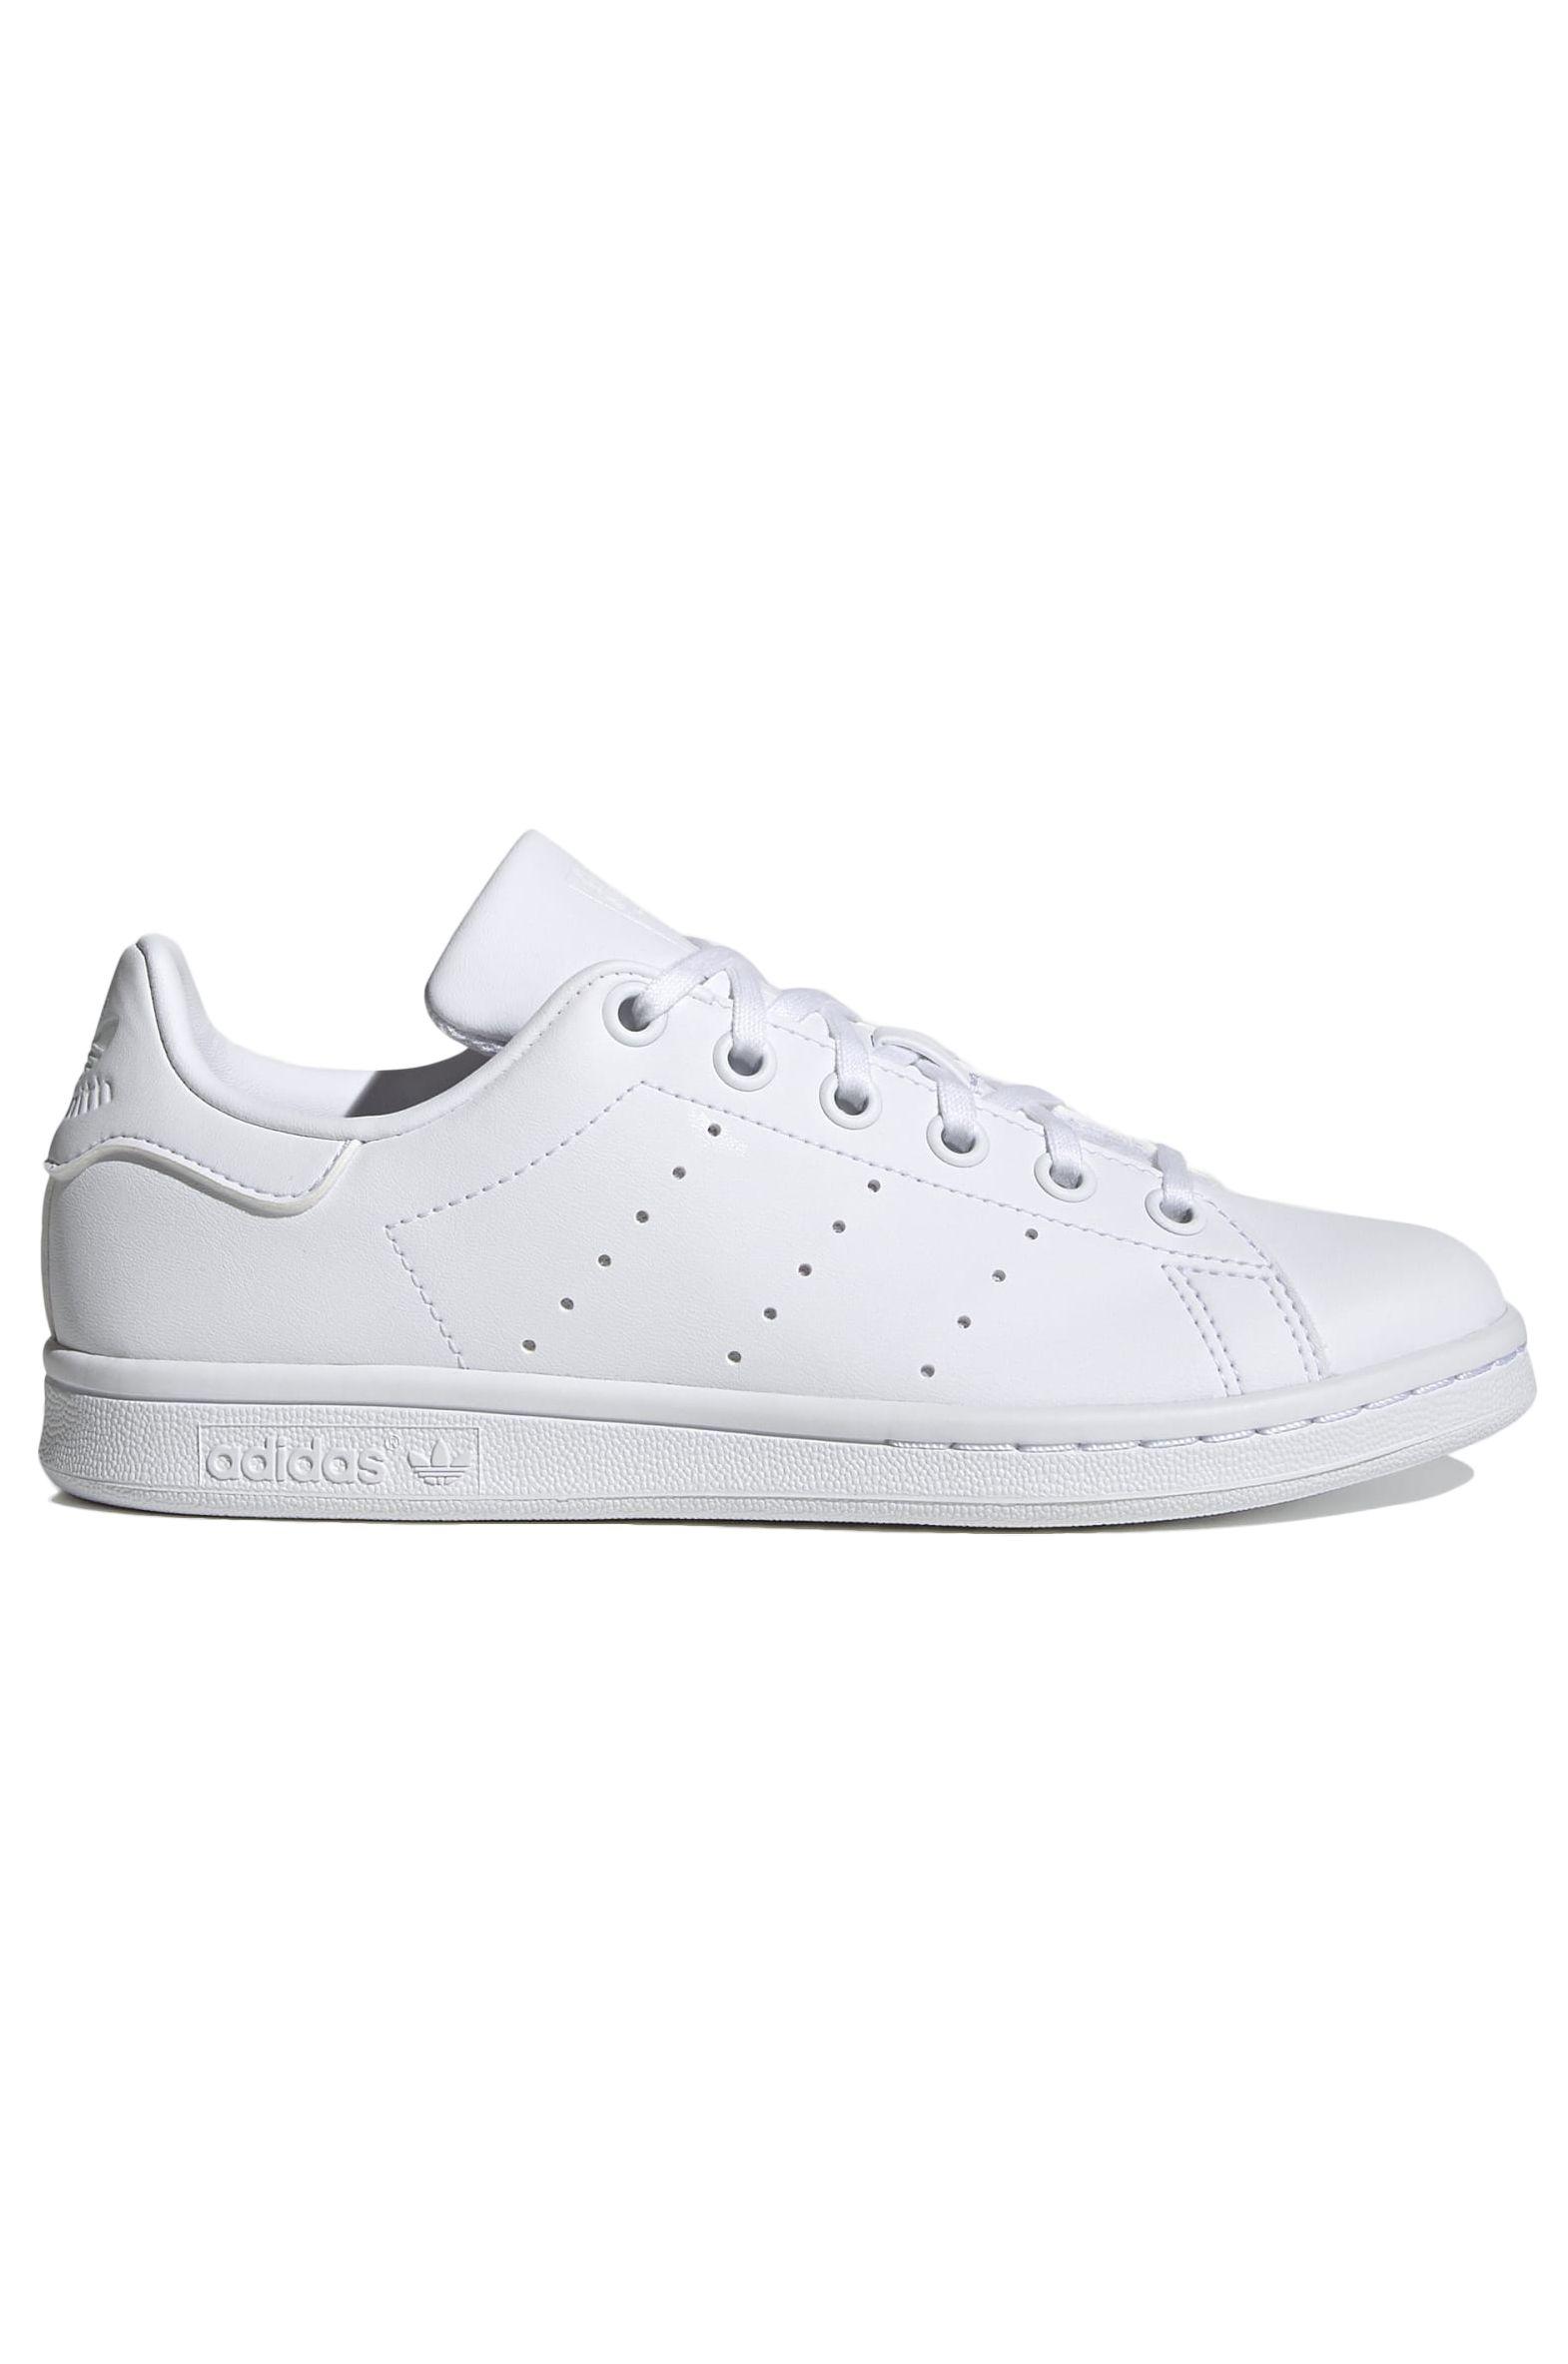 Adidas Shoes STAN SMITH J Ftwr White/Ftwr White/Ftwr White